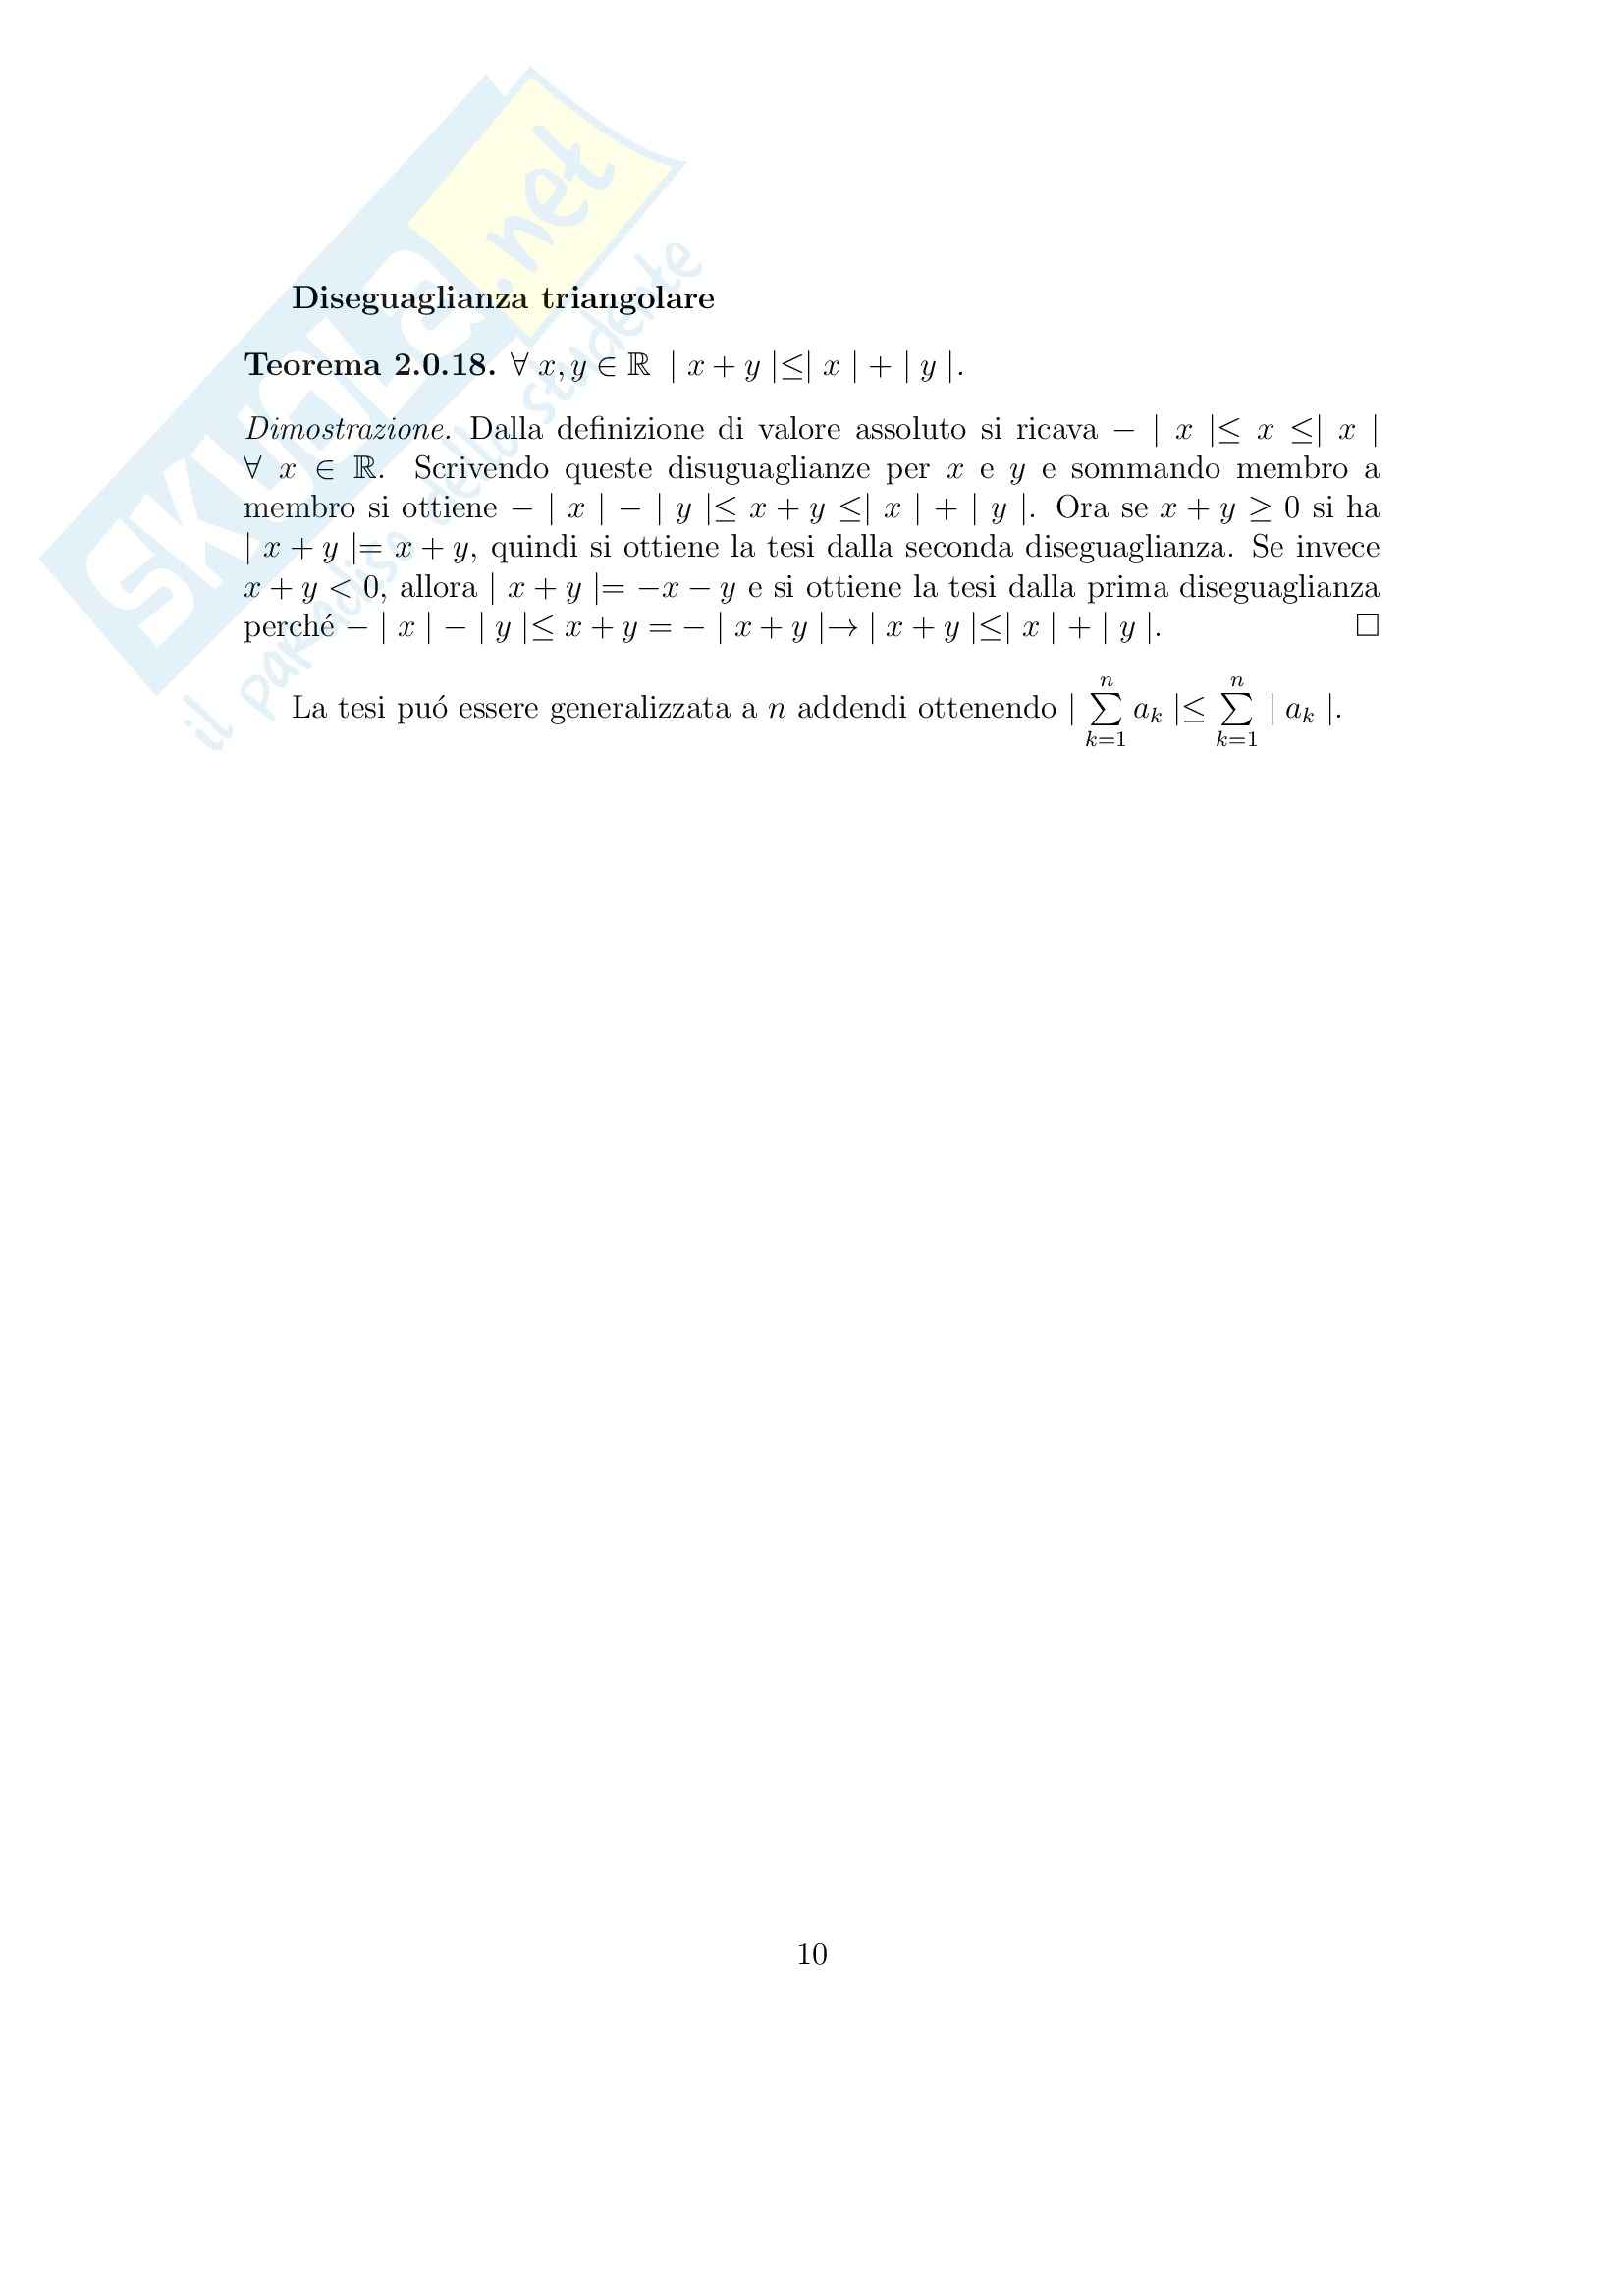 Analisi matematica 1 - Appunti Pag. 11